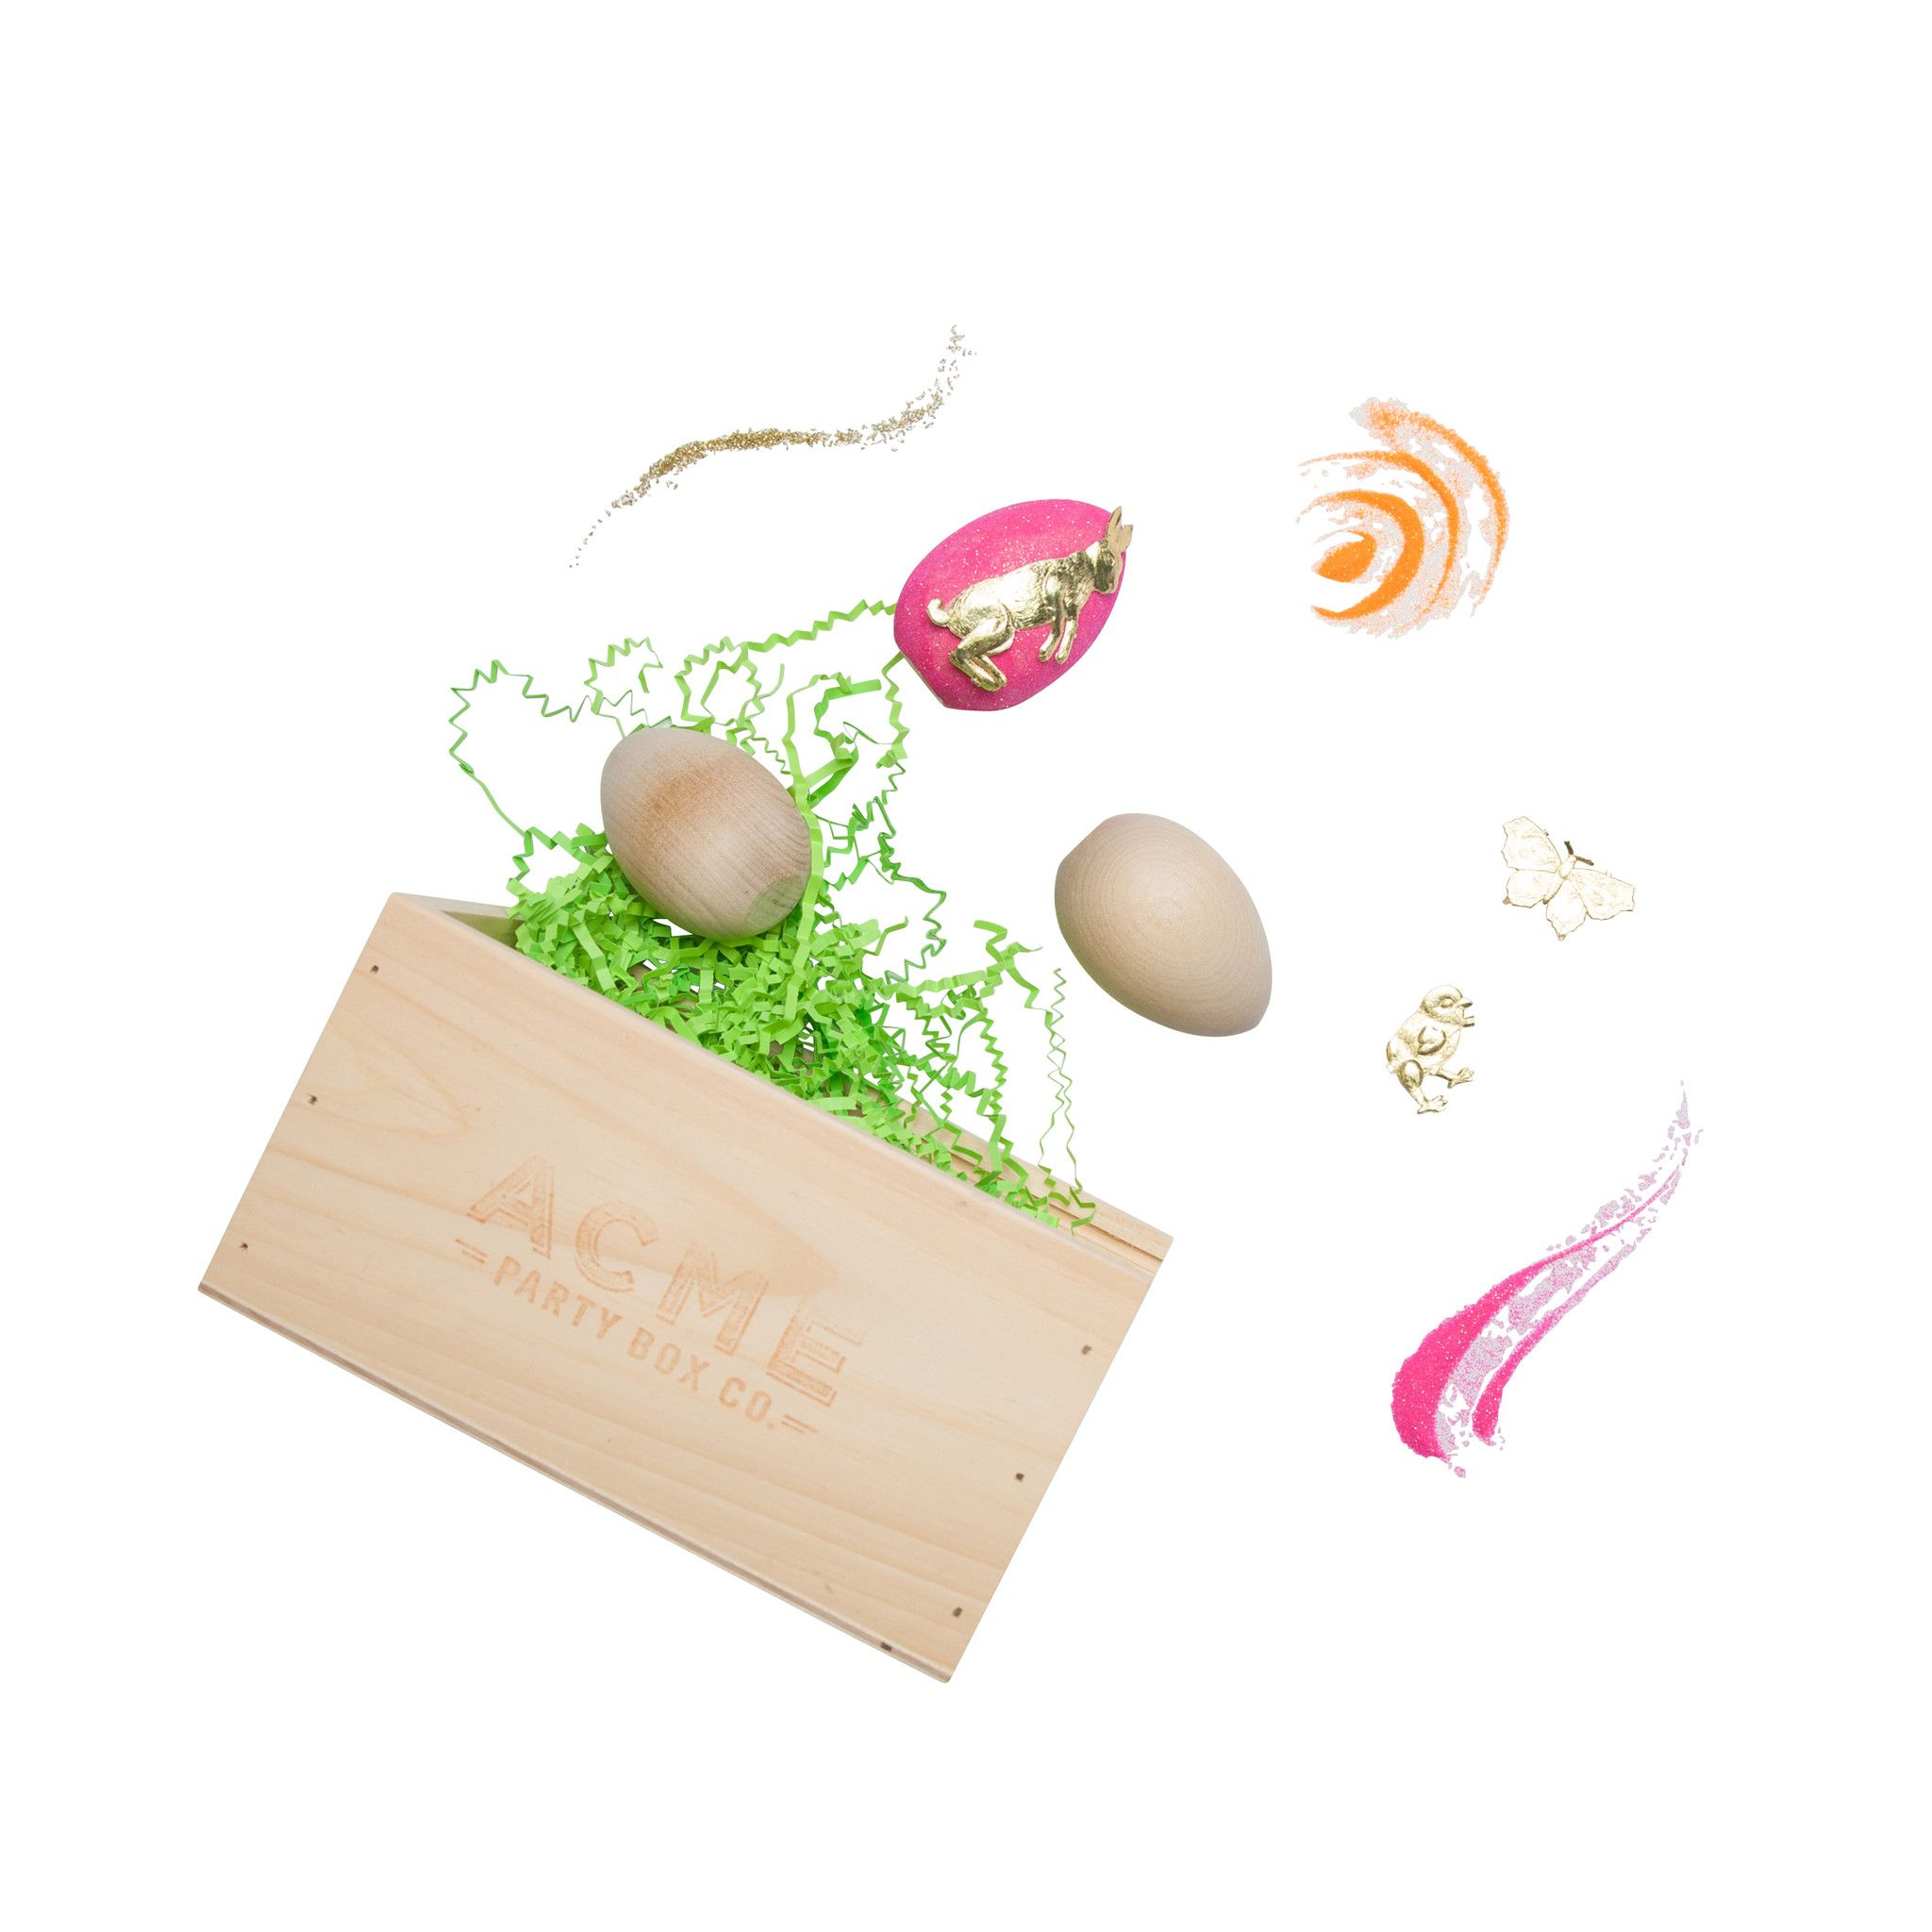 ACME Party Box Company - Egg Decorating Kit